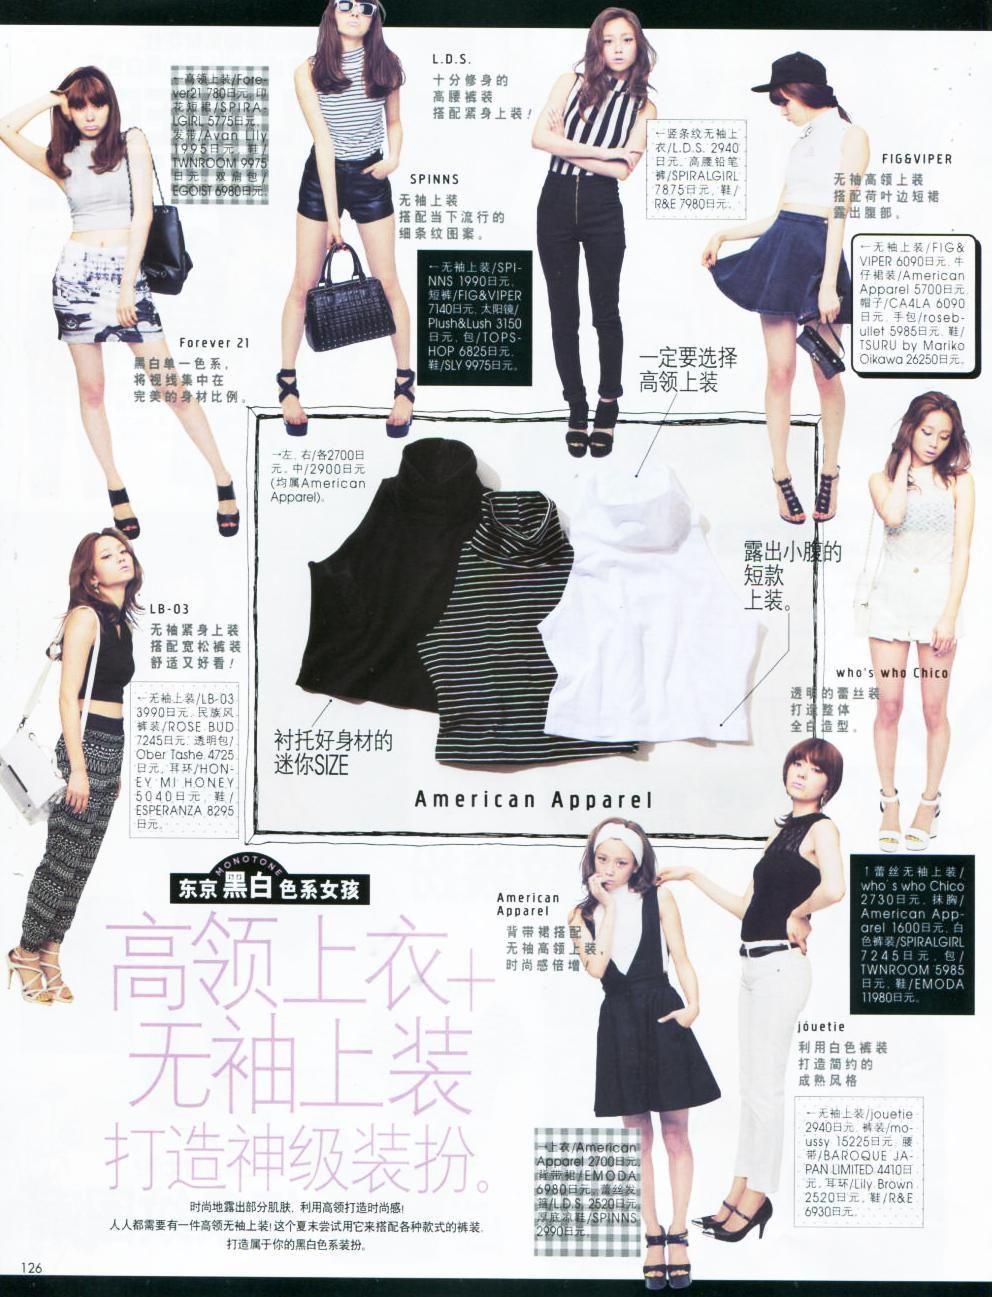 27963ed750a23 Vivi magazine featured the Cotton Spandex Sleeveless Turtleneck Crop ...